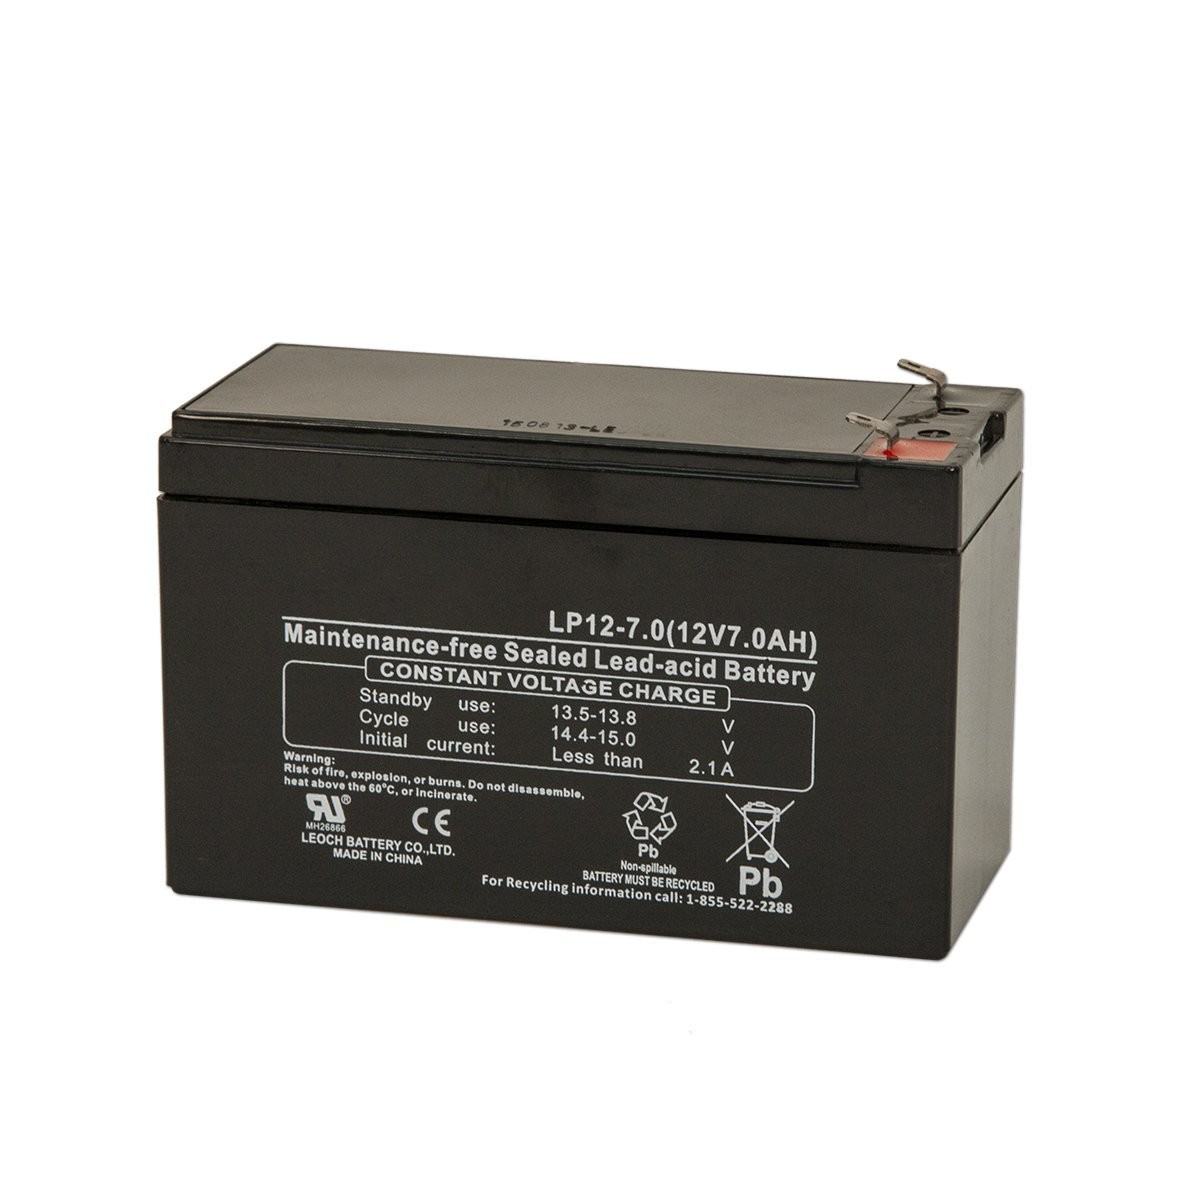 Gto Pro Sw 2002xls Dual Operator Kit 500lb Or 16ft